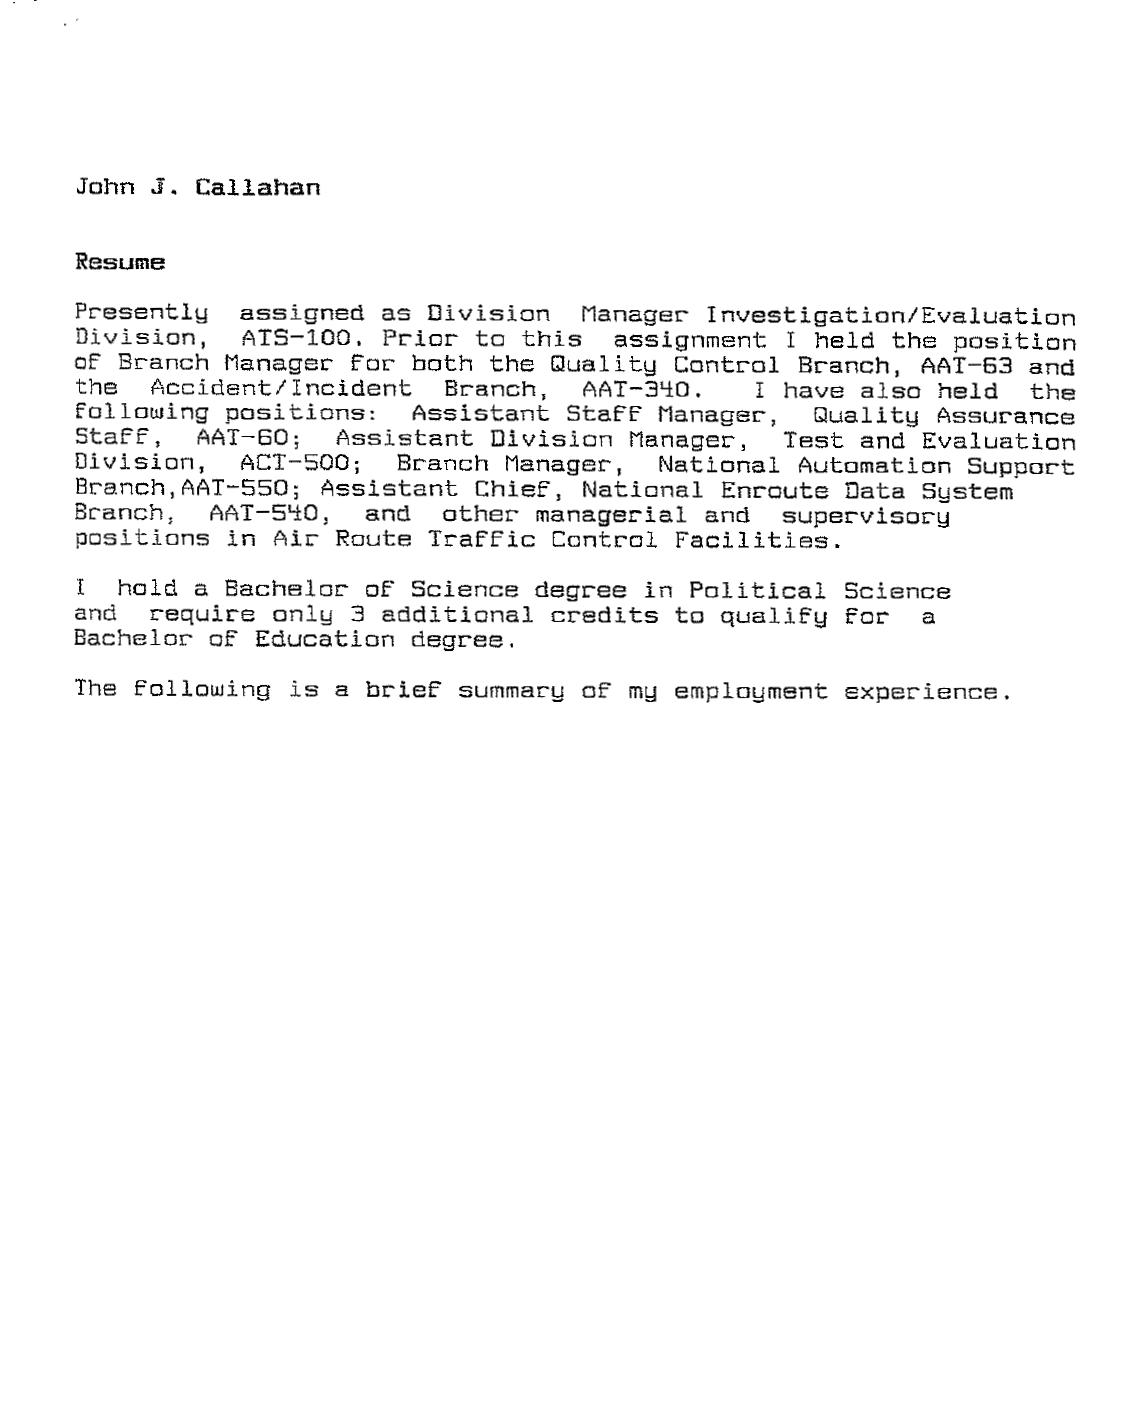 Material Tester Resume Sample: John Callahan & The JAL-1628 UFO Encounter; FAA